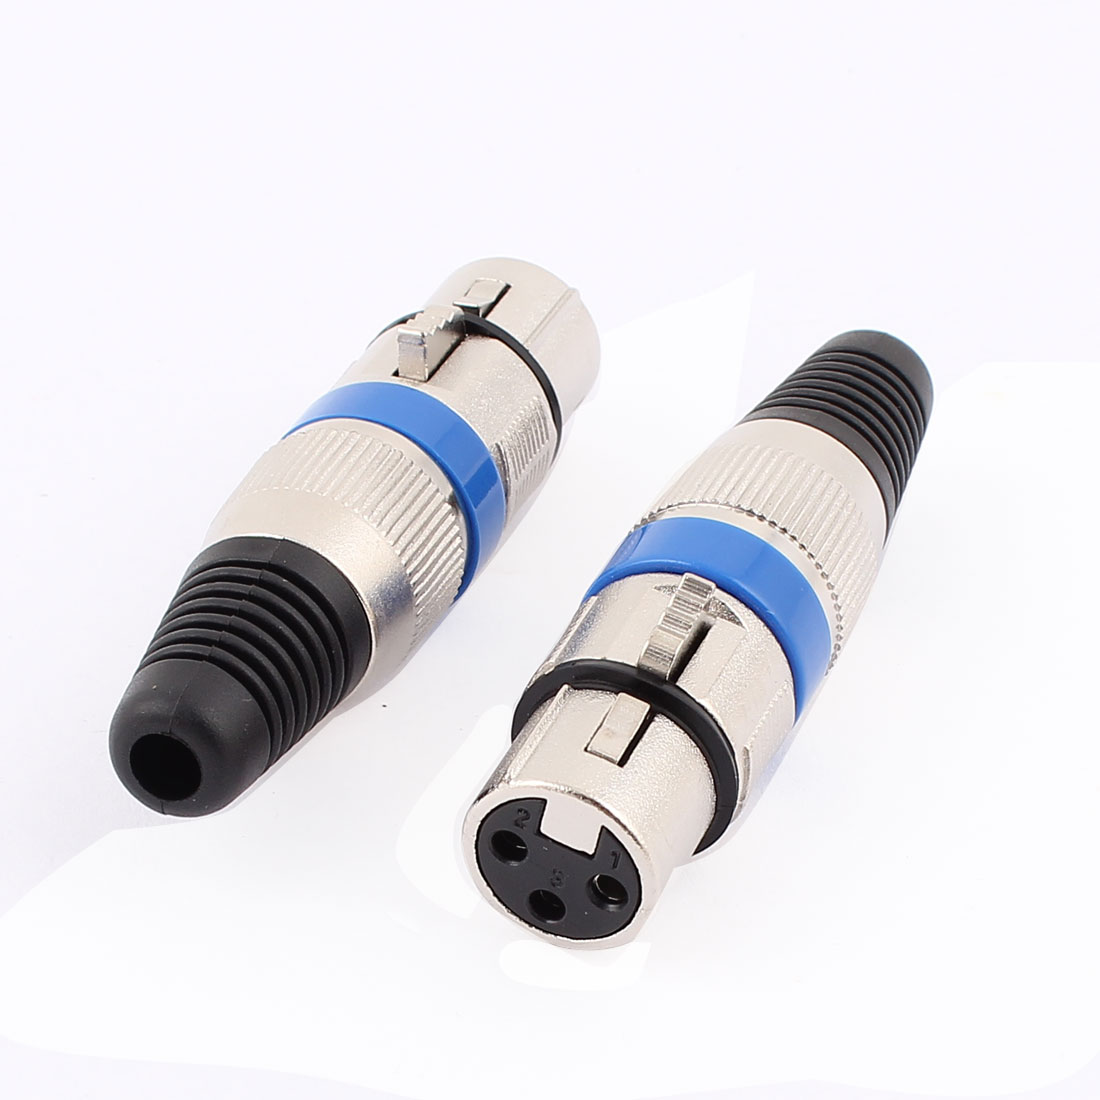 2pcs XLR 3P Female Jack Mic Microphone Audio Cable Connector Blue Silver Tone